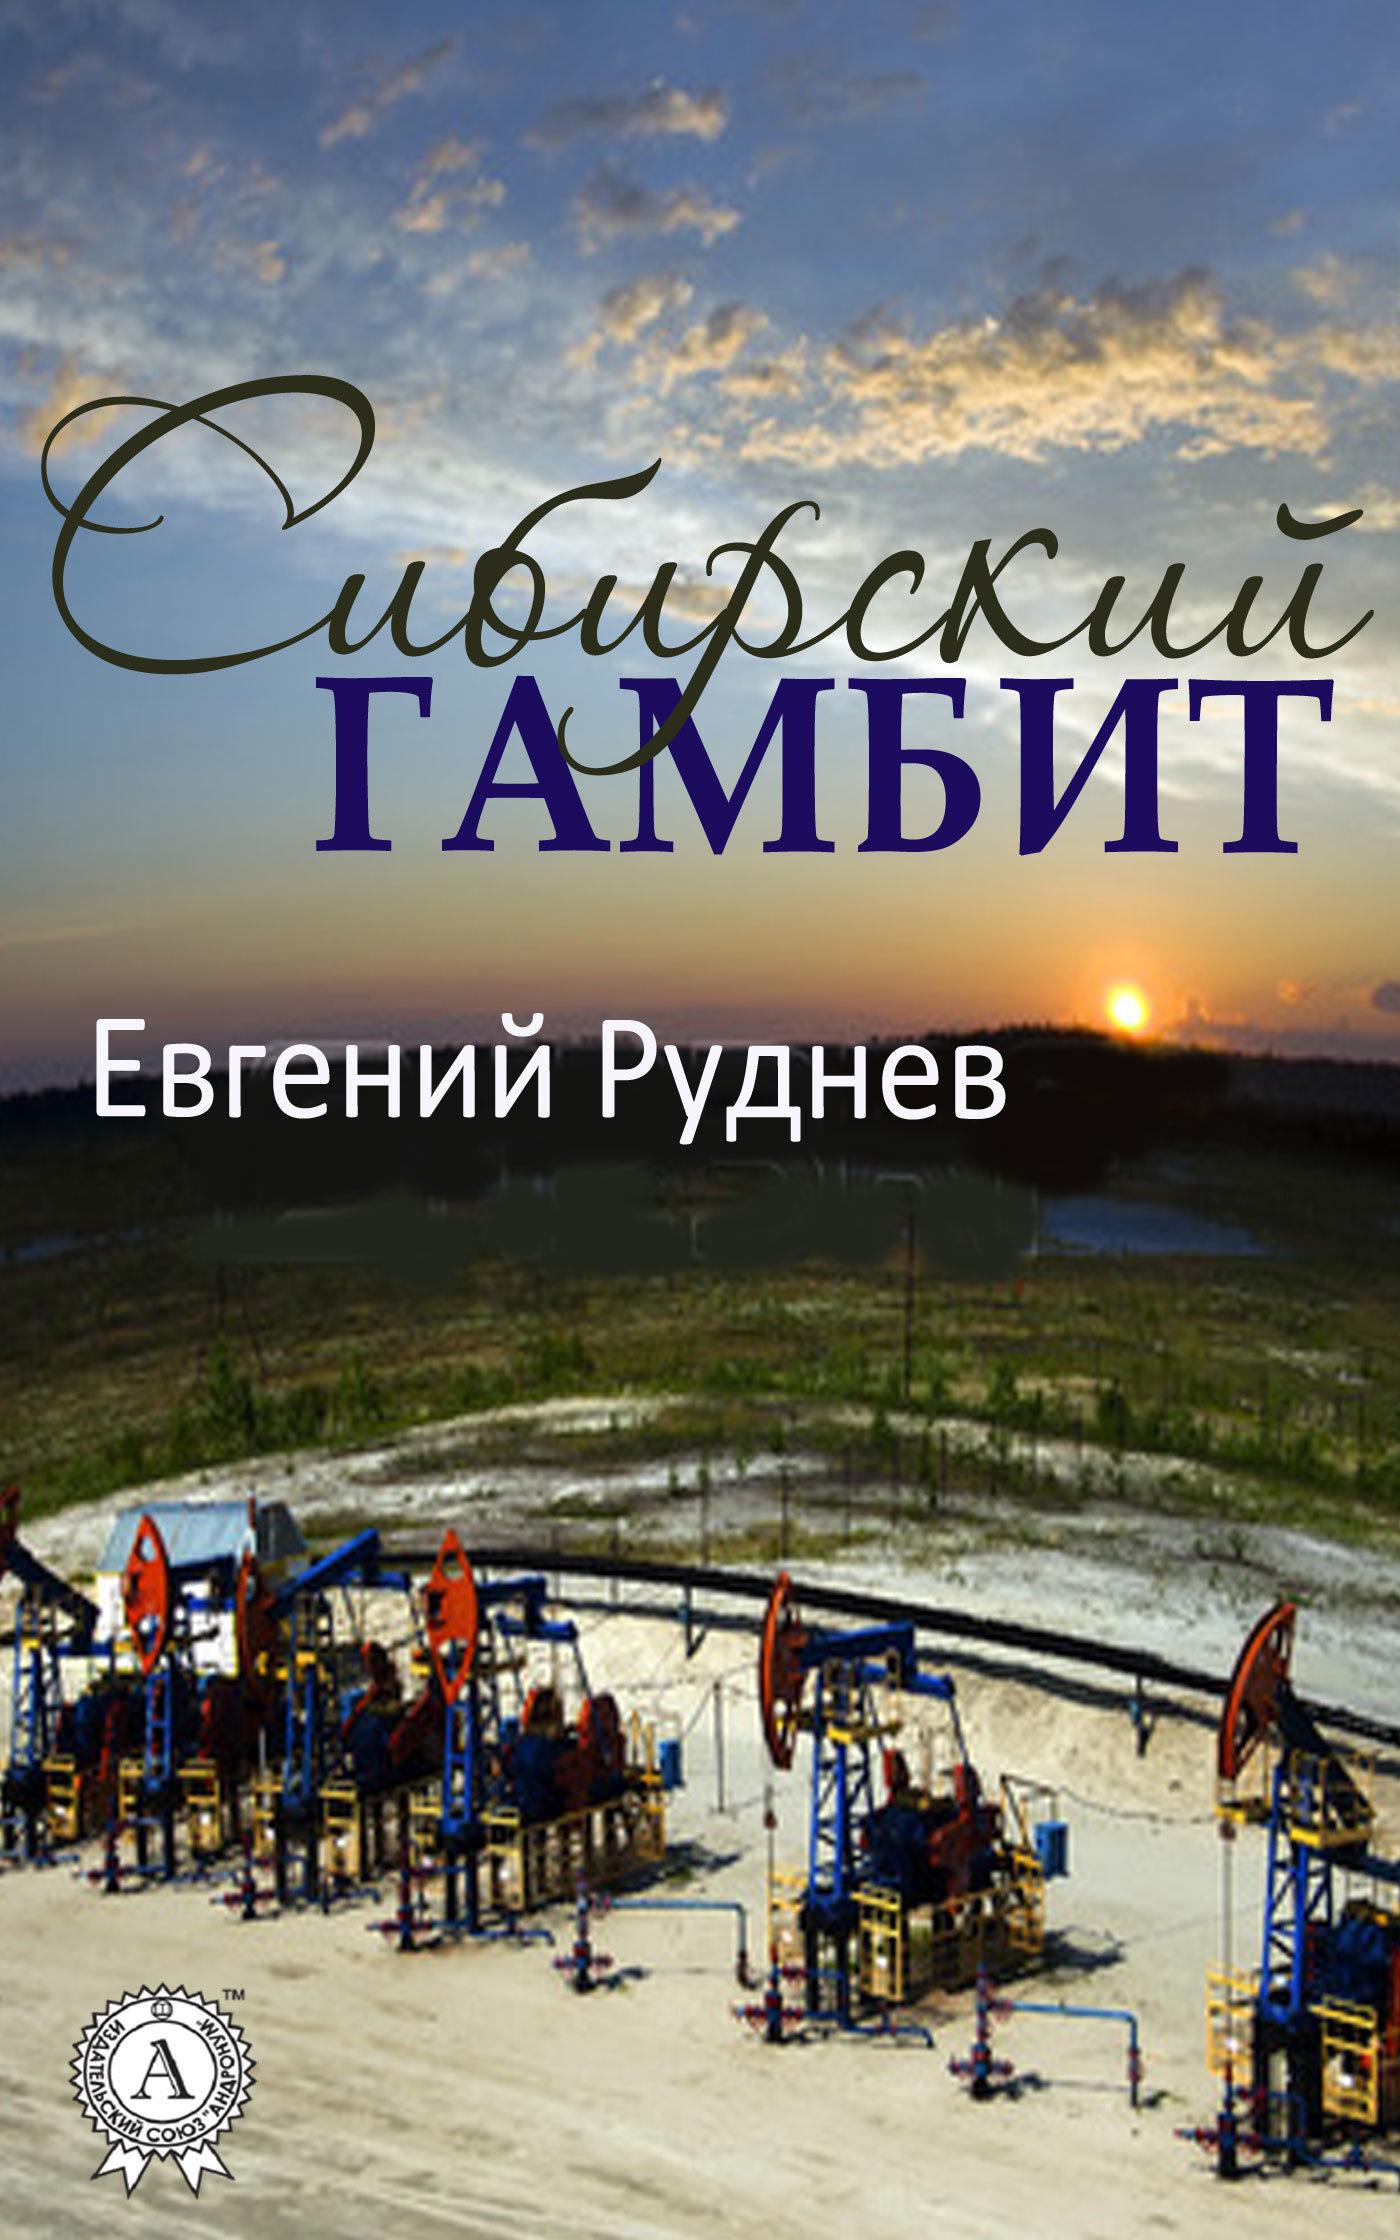 Евгений Руднев Сибирский гамбит симбитер для ребенка в киеве